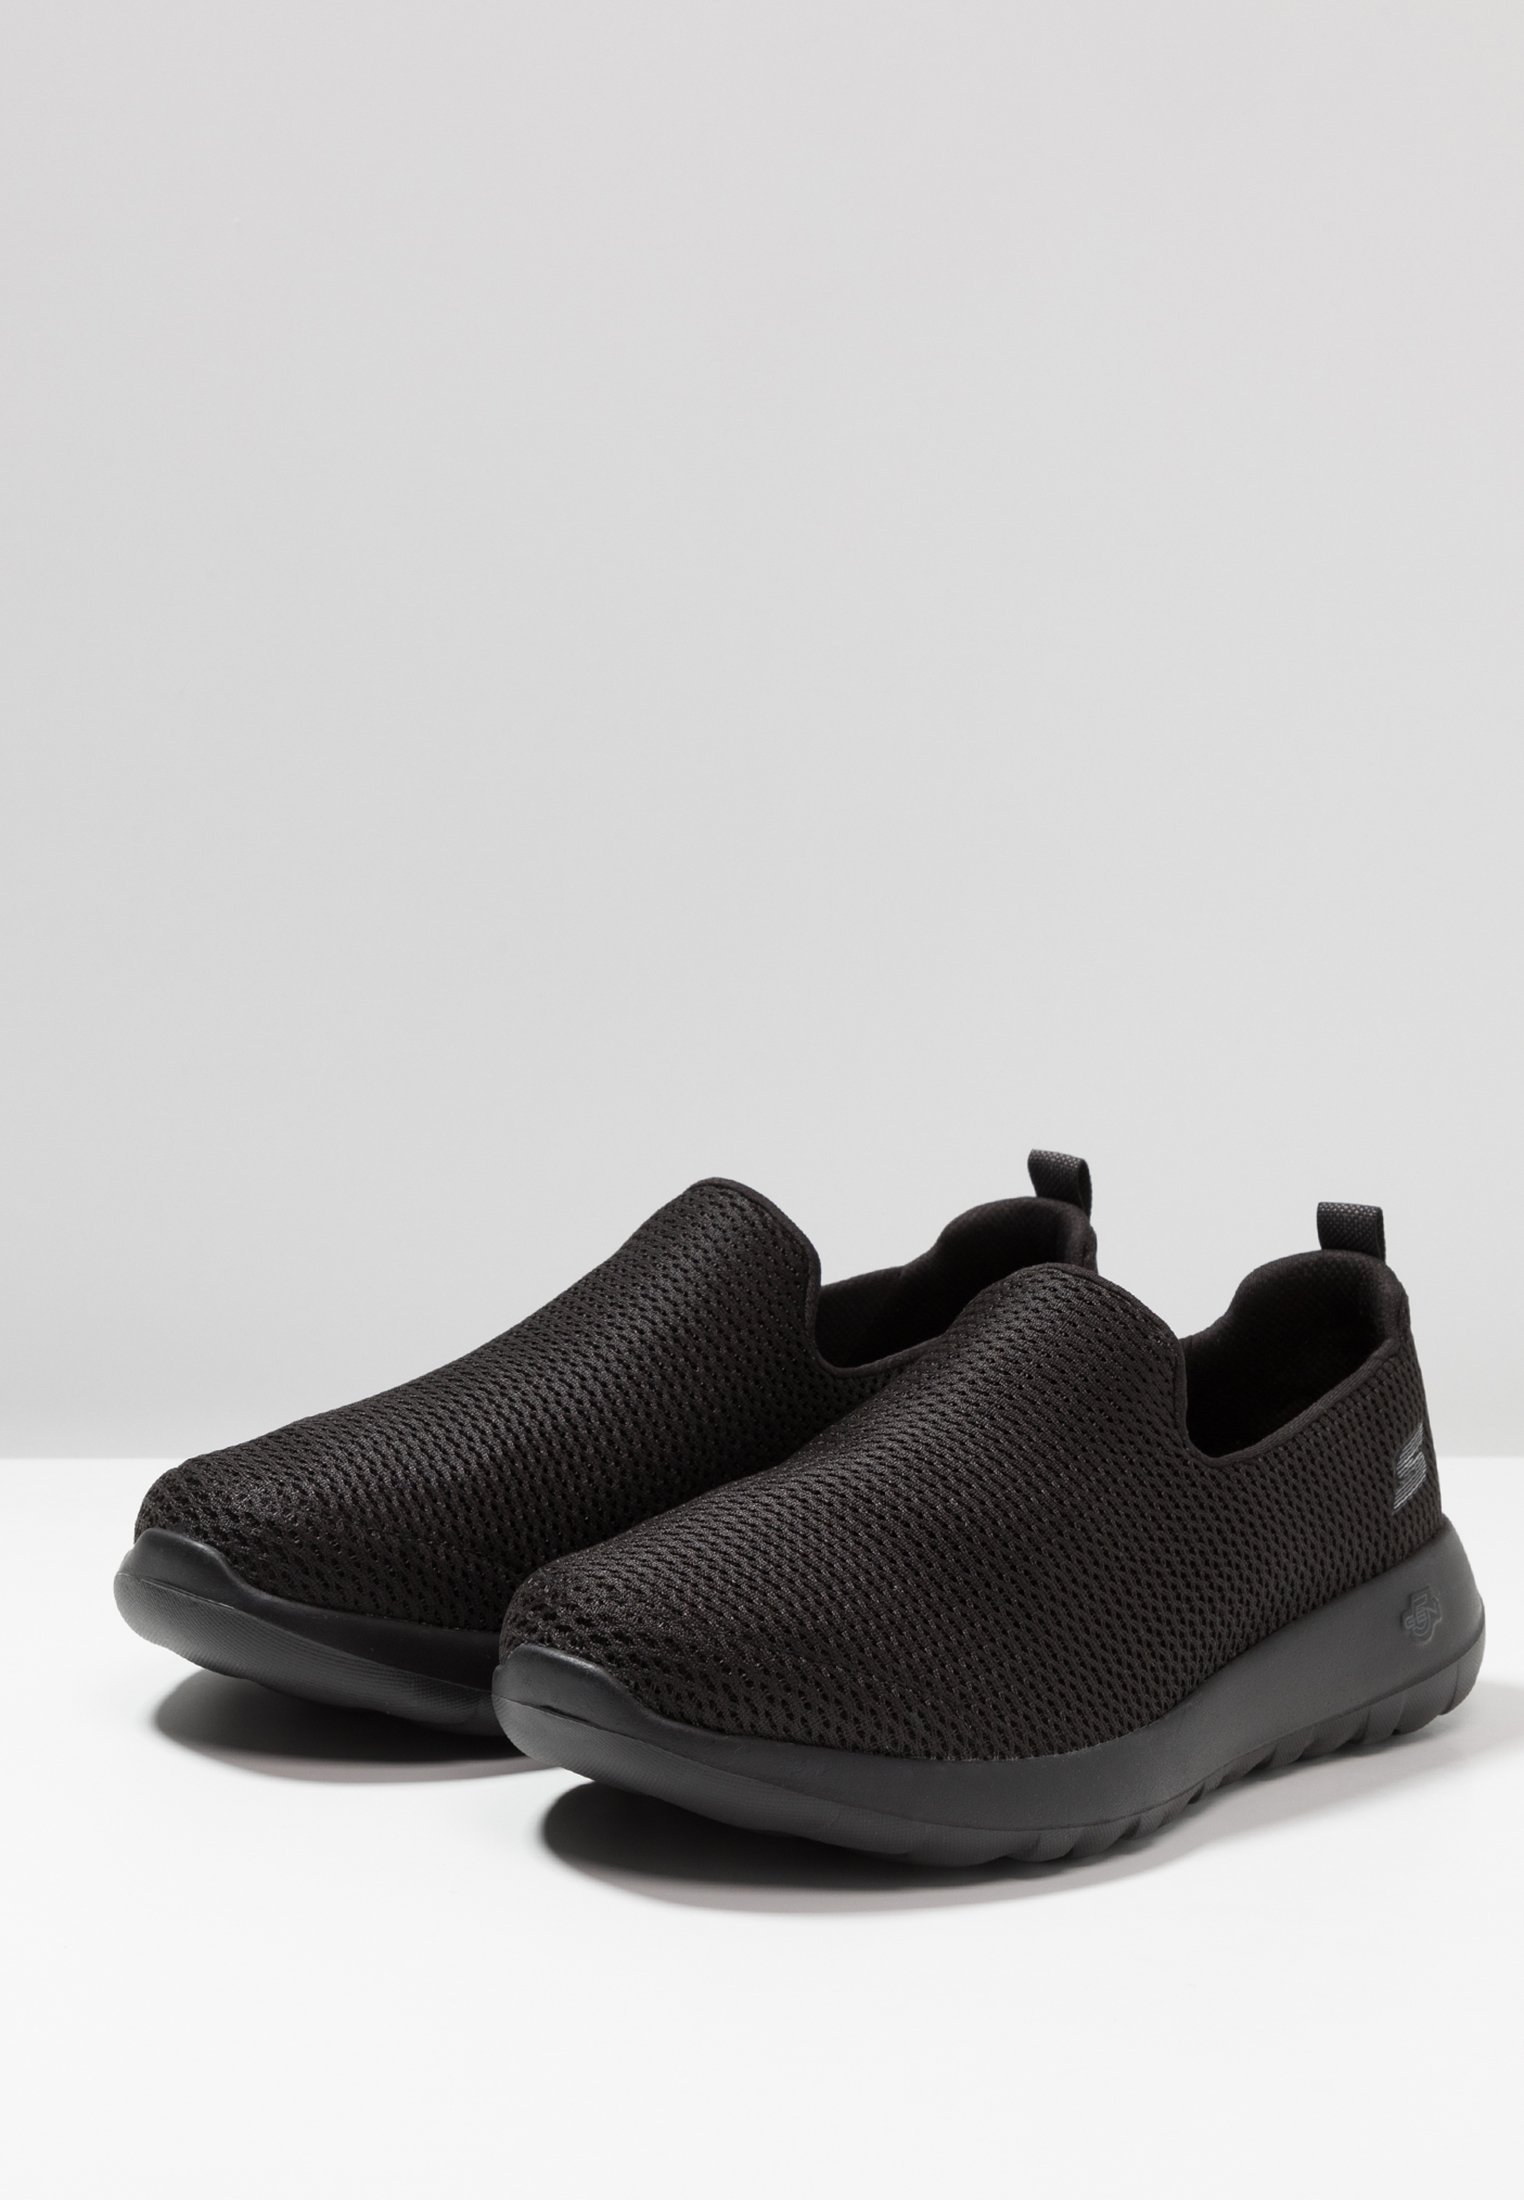 Super Recommend Discount Men's Shoes Skechers Performance GO MAX Walking trainers black K3psVPqmV Wppt0Og6l